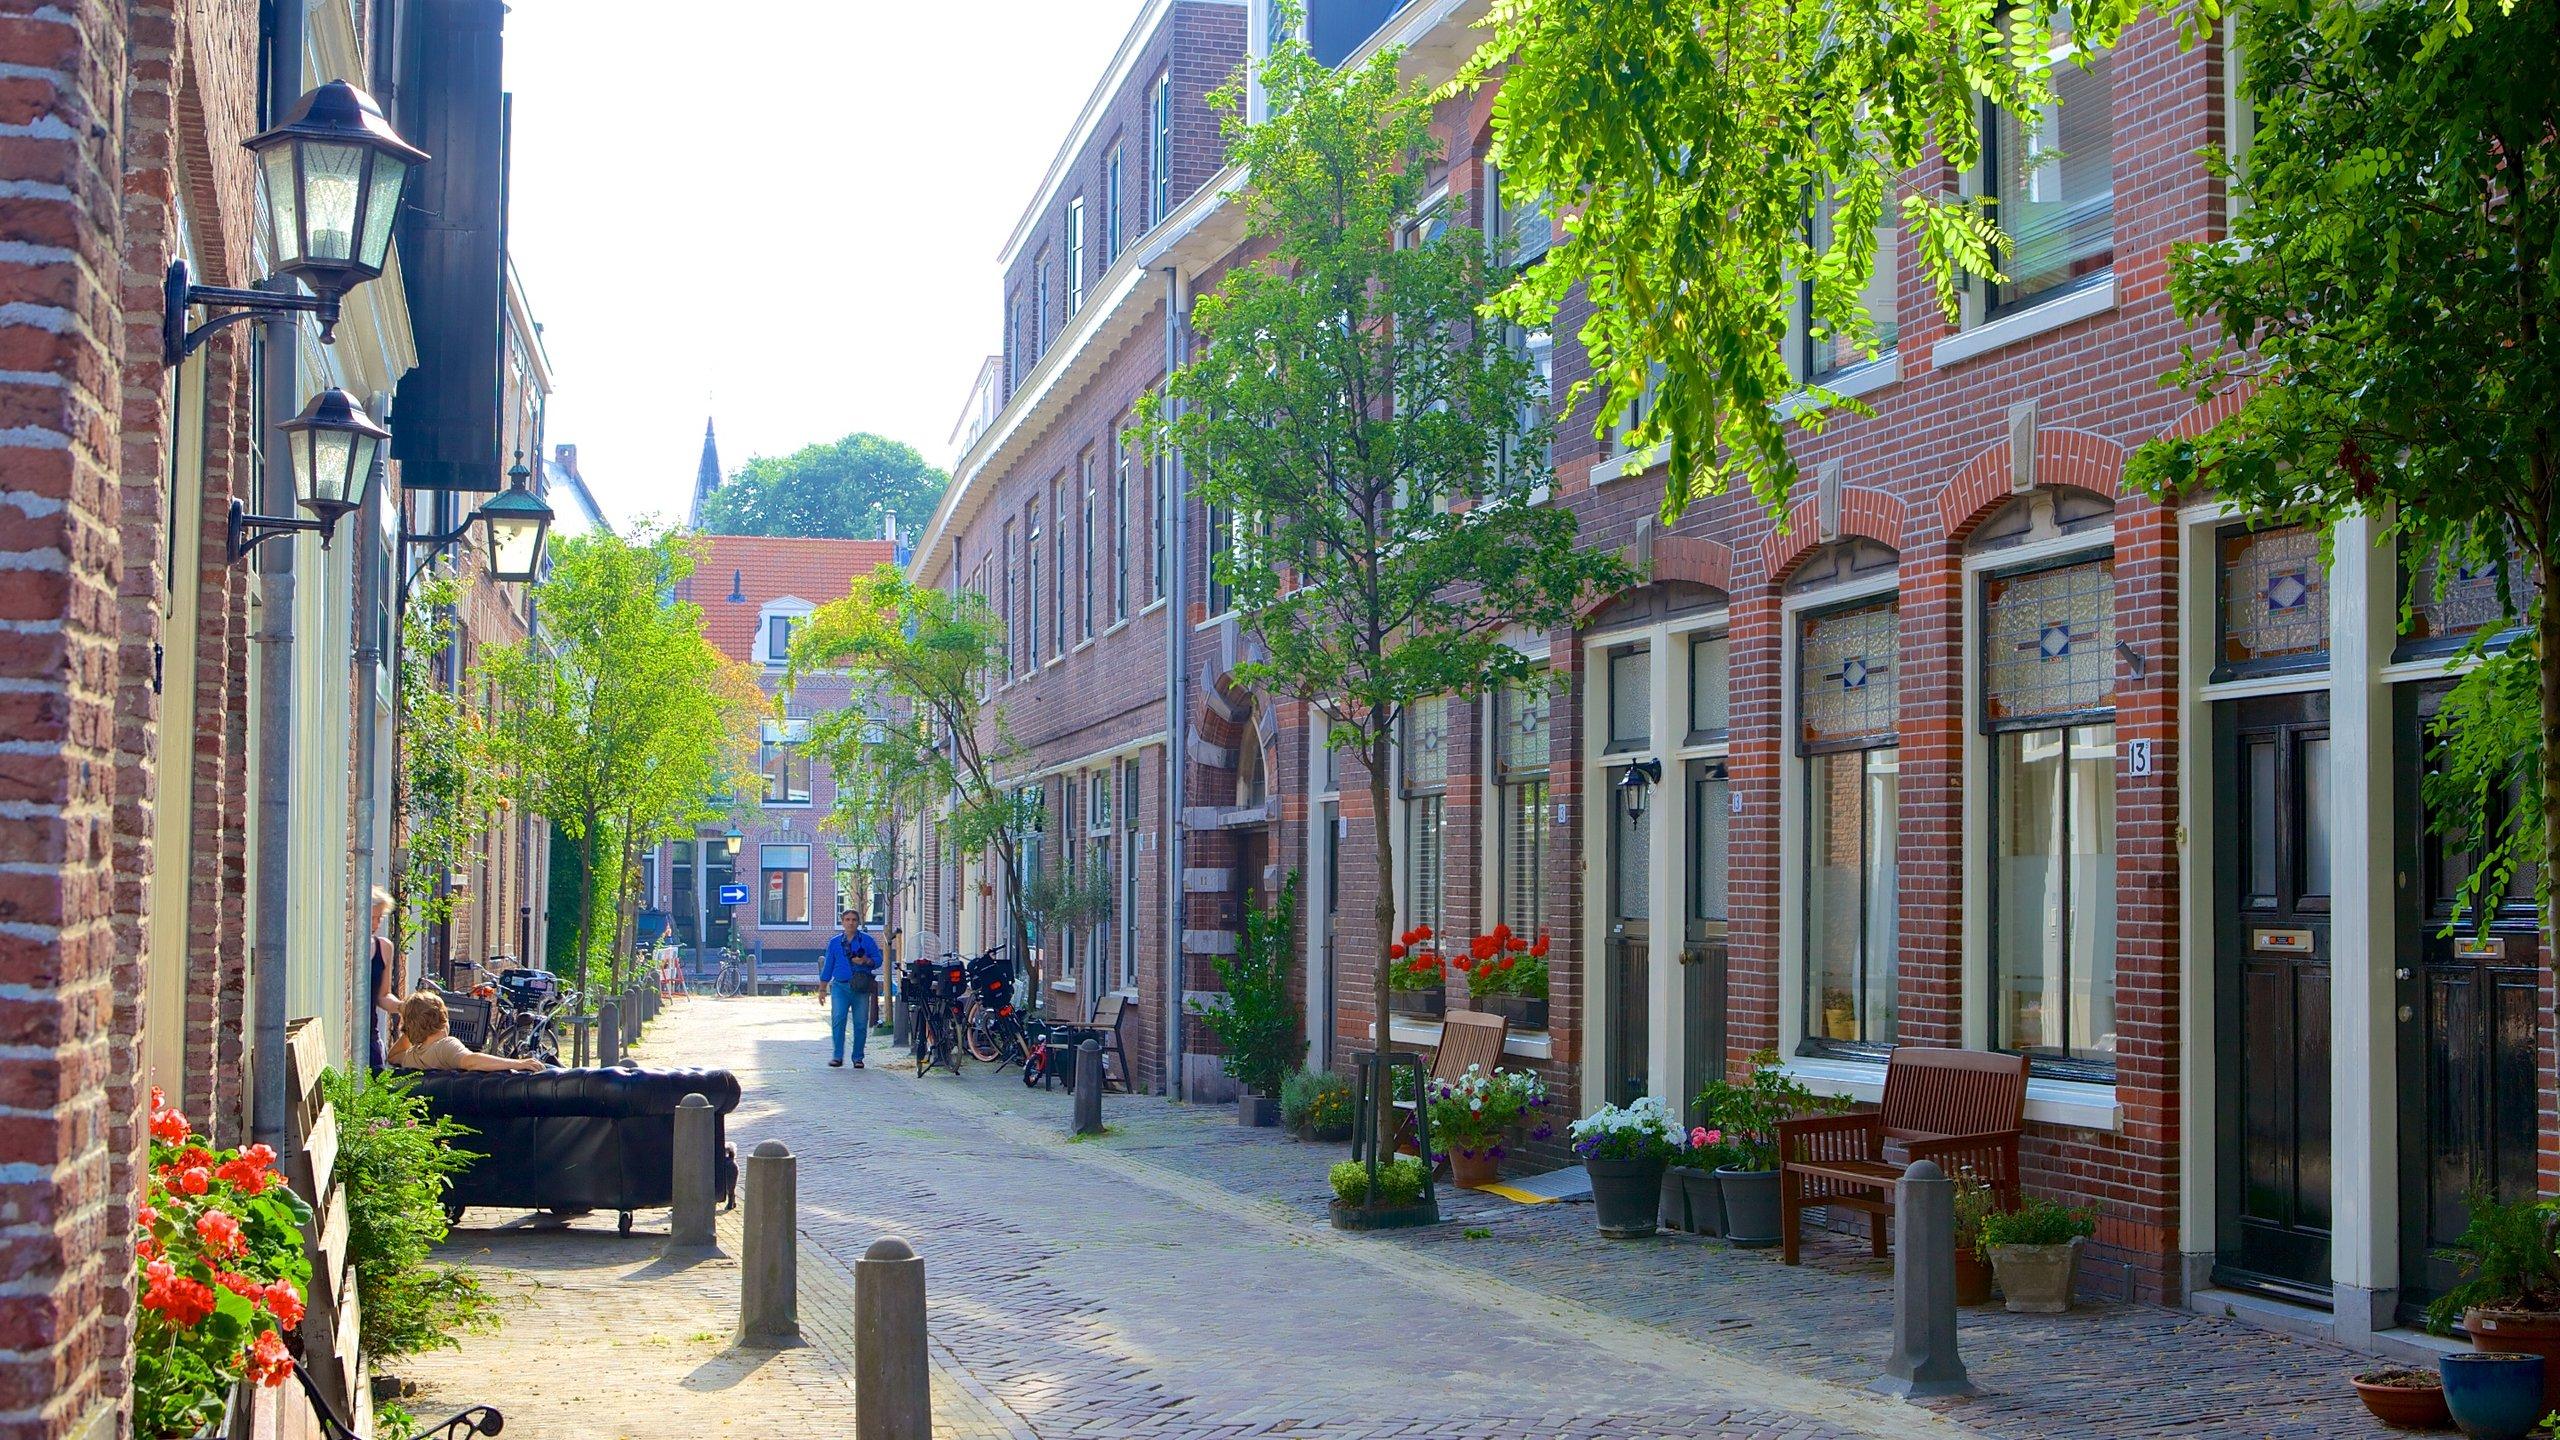 Oude Stad, Haarlem, North Holland, Netherlands